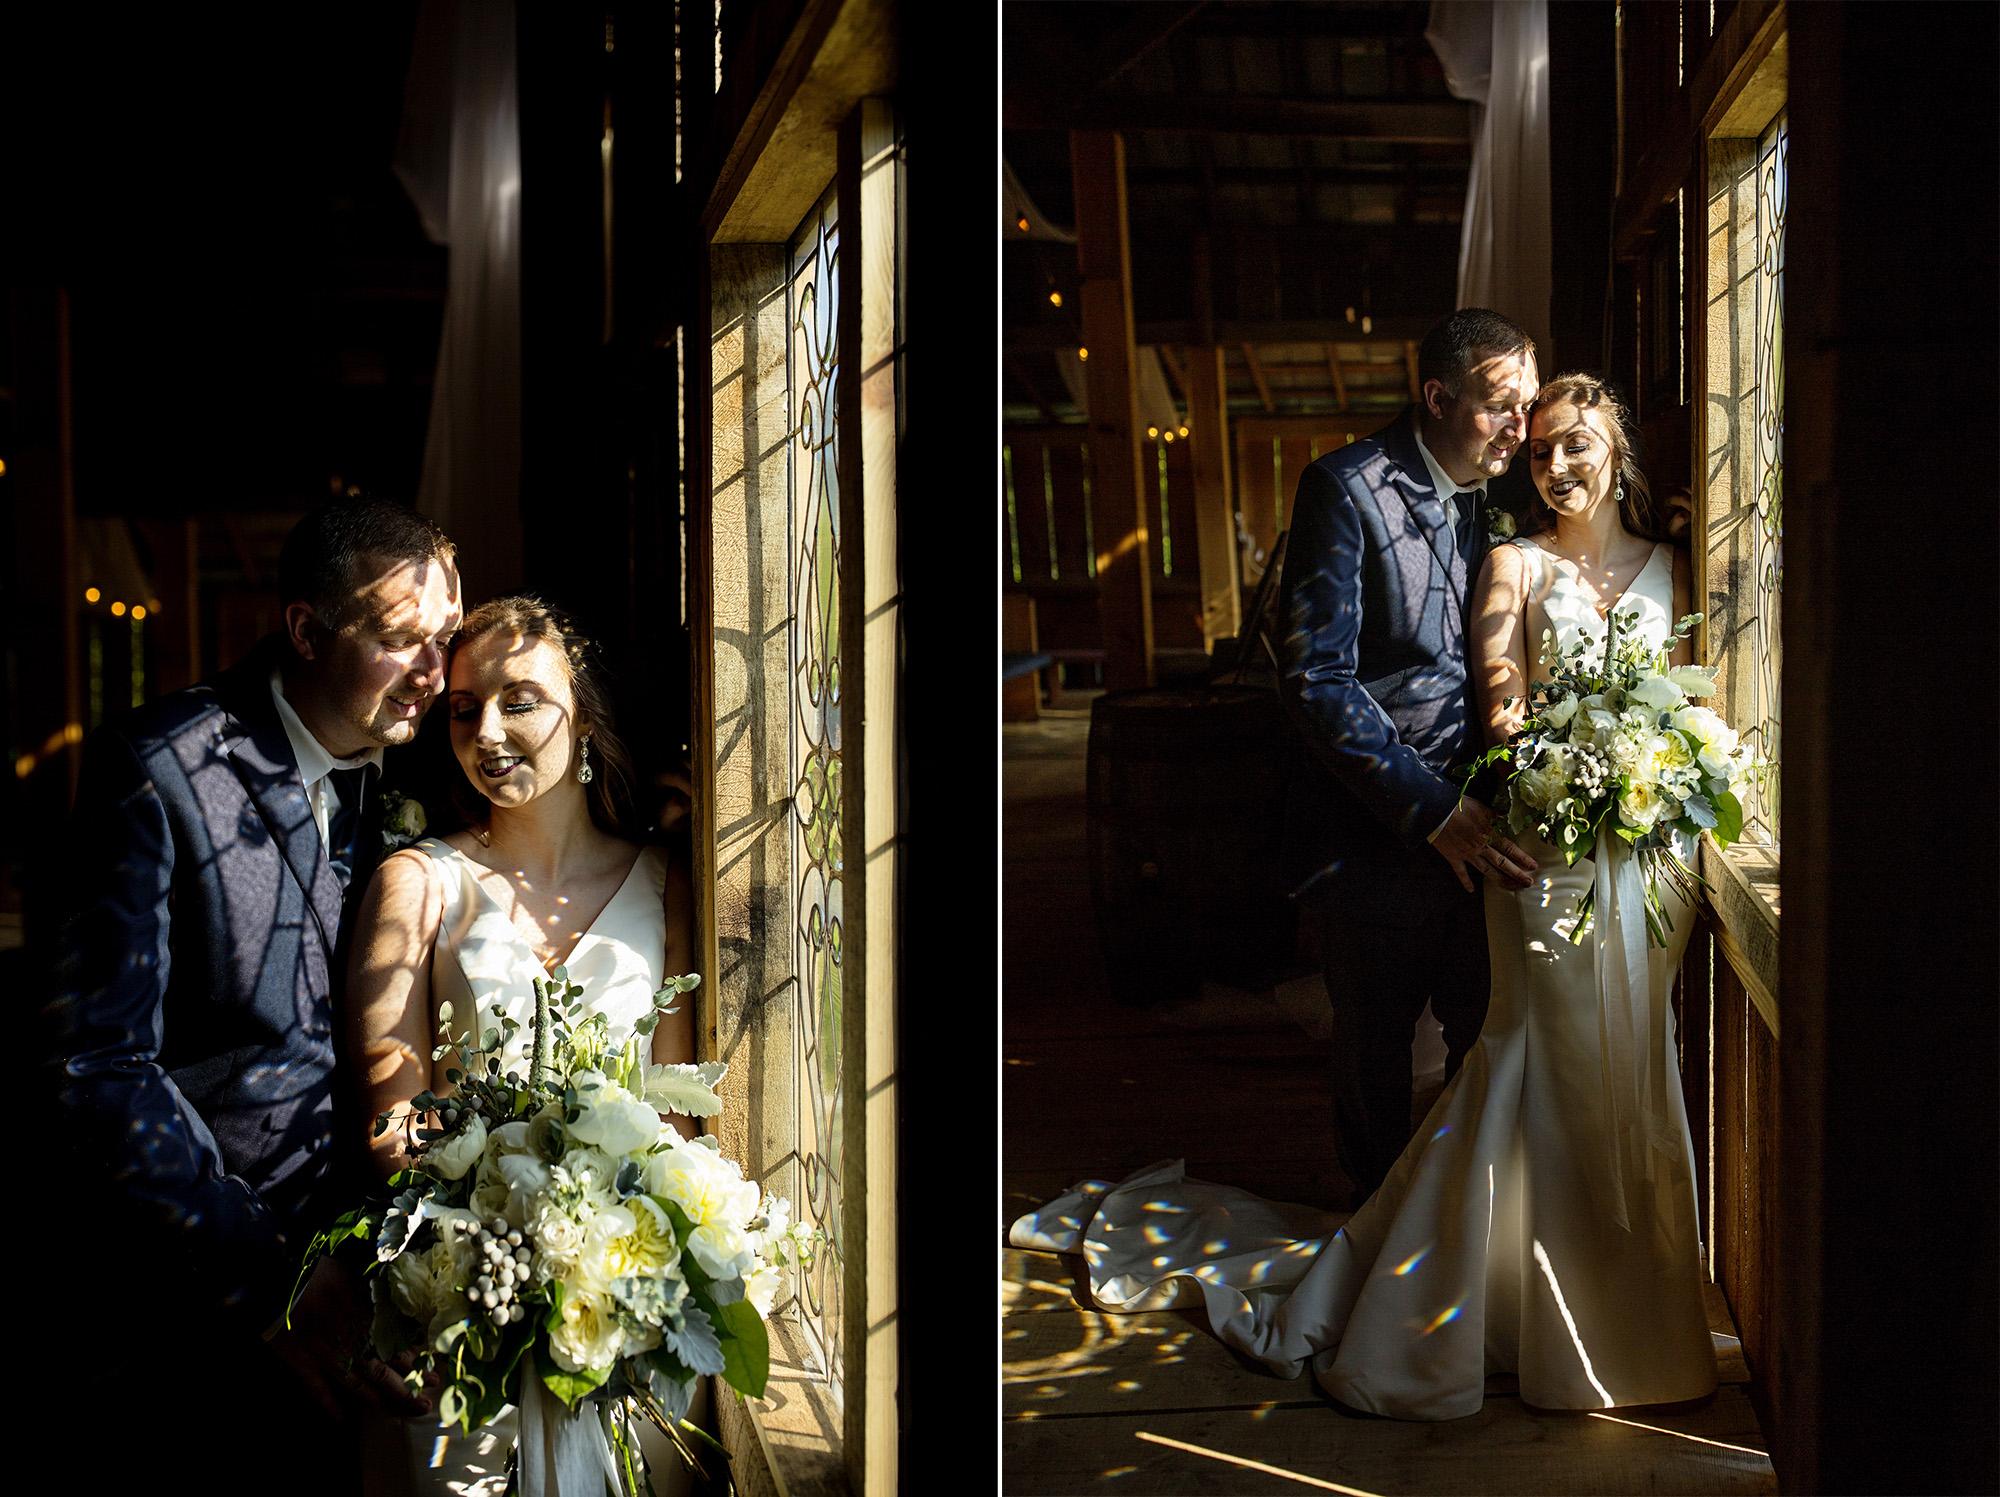 Seriously_Sabrina_Photography_Red_River_Gorge_Wedding_Barn_Robinson75.jpg